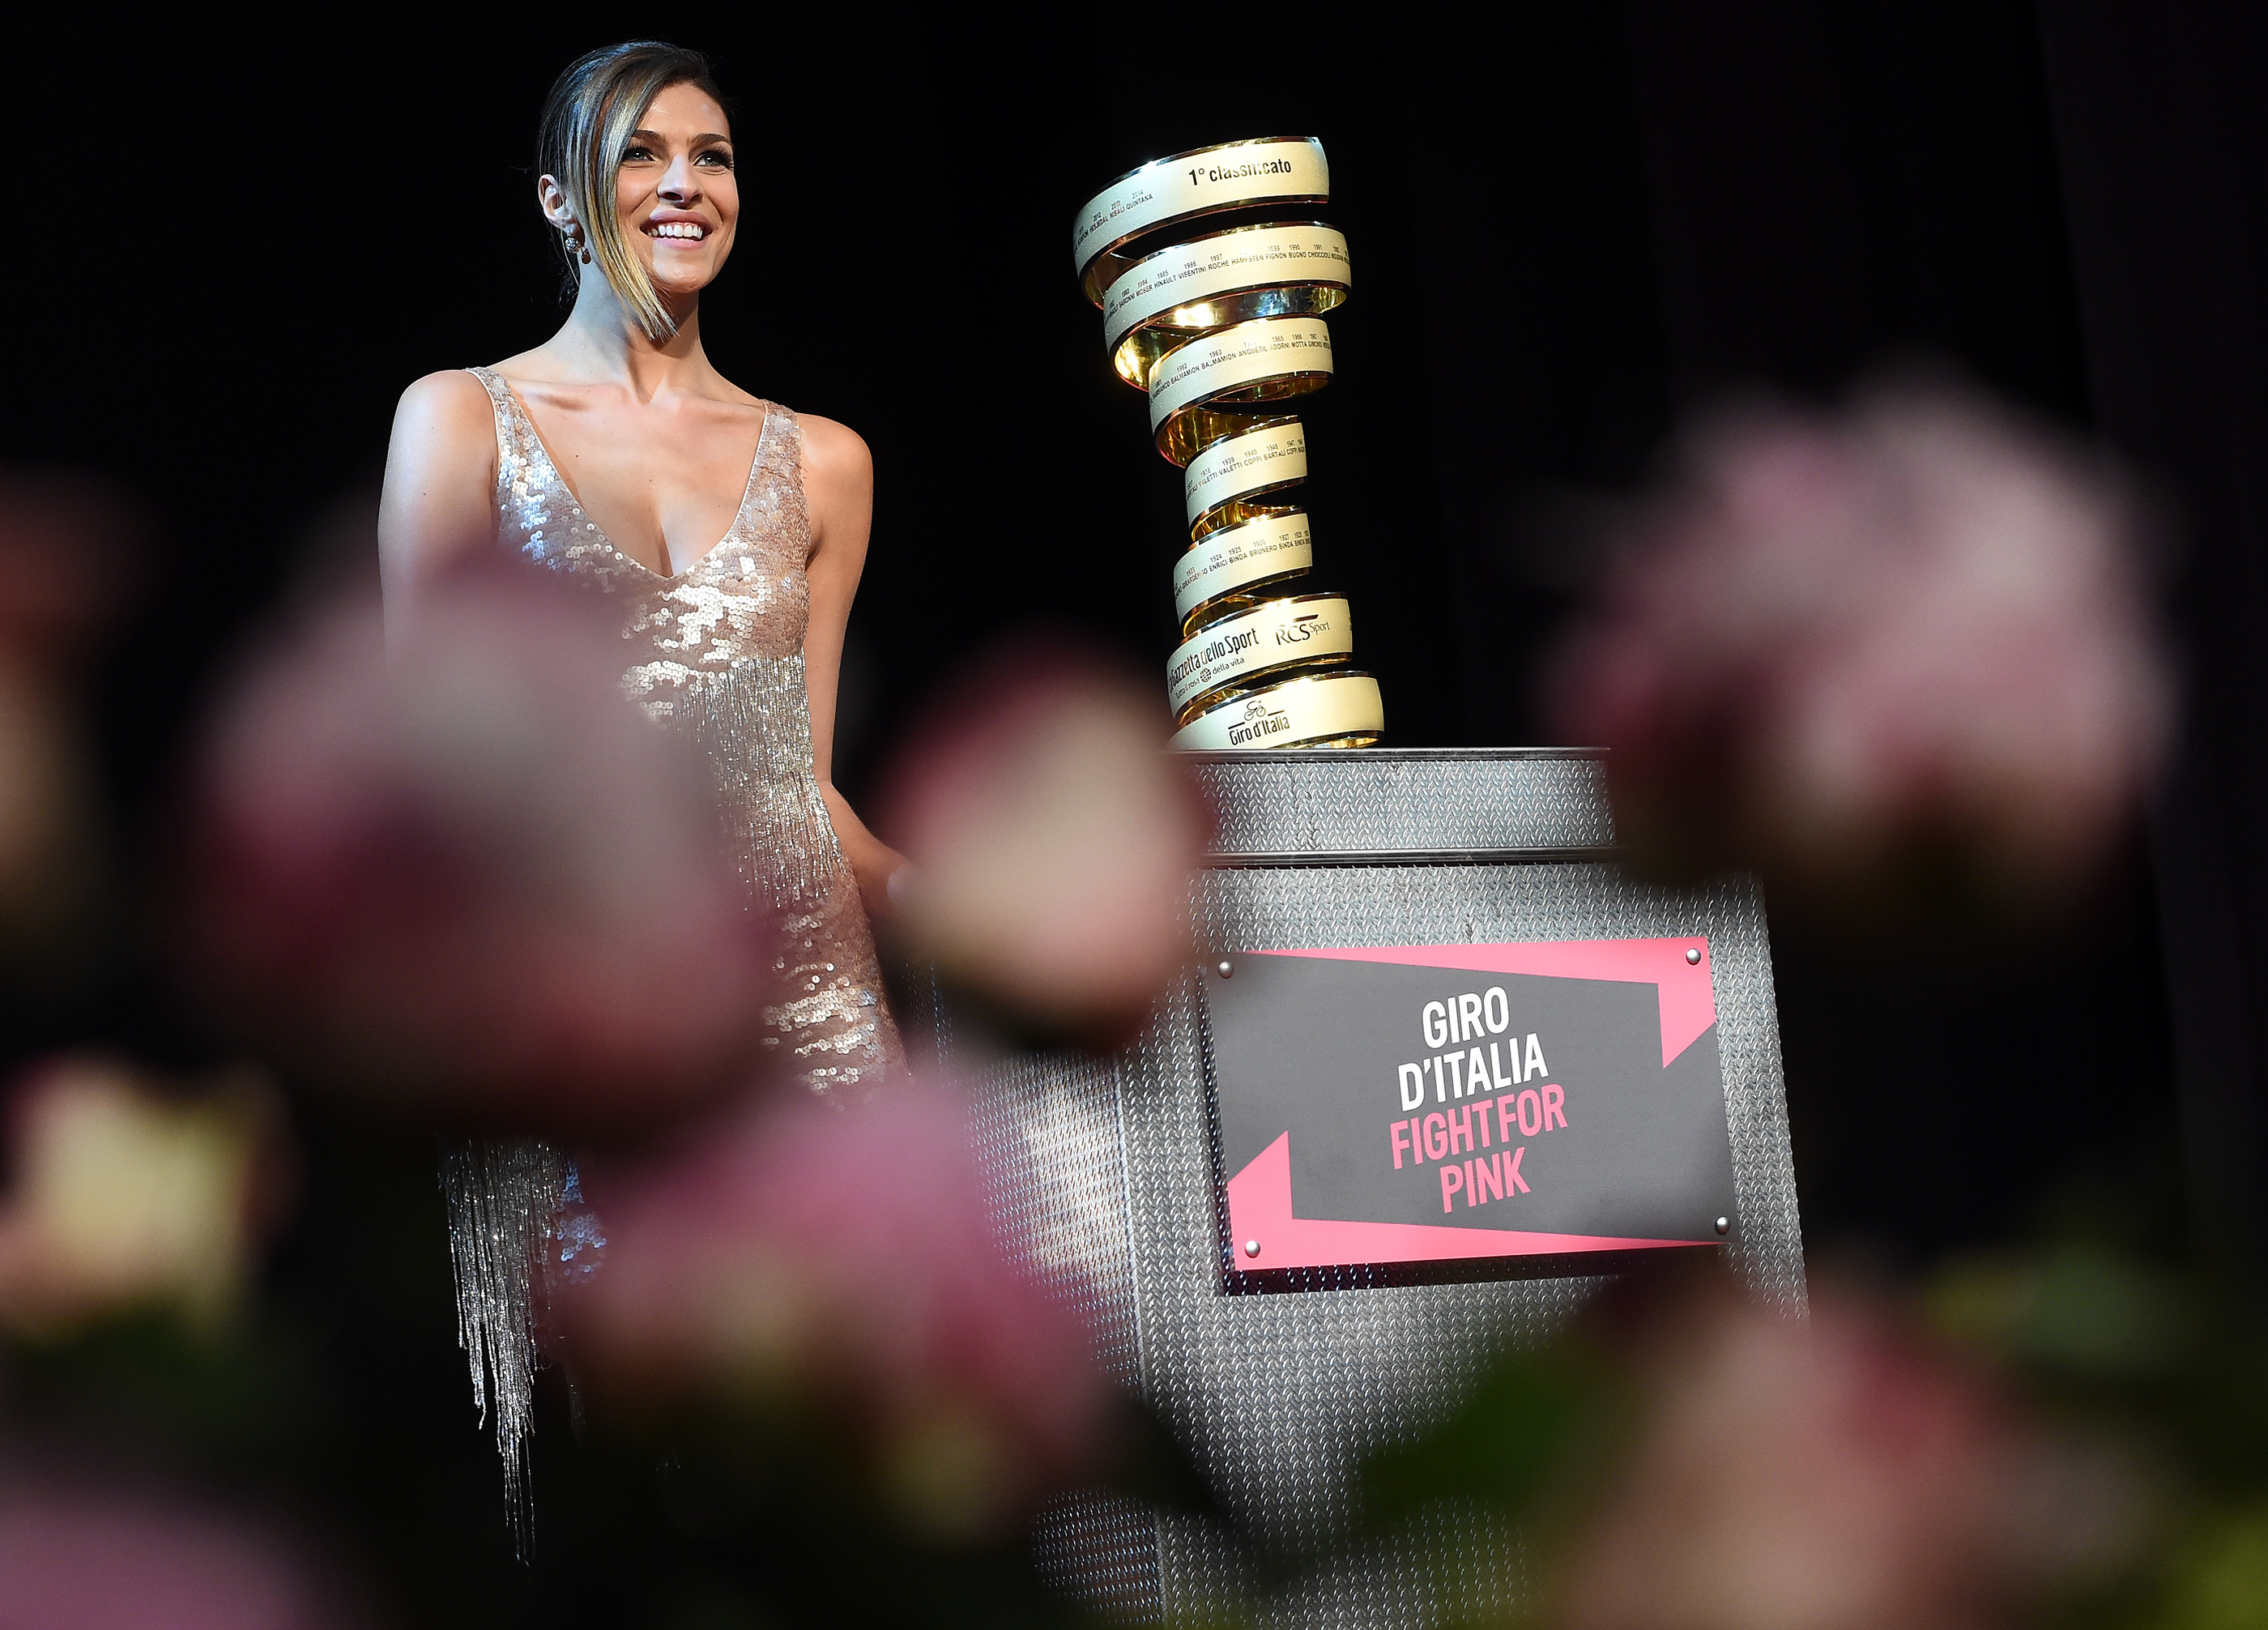 Giro d'Italia 2015: Presentazione 98/mo Giro d'Italia